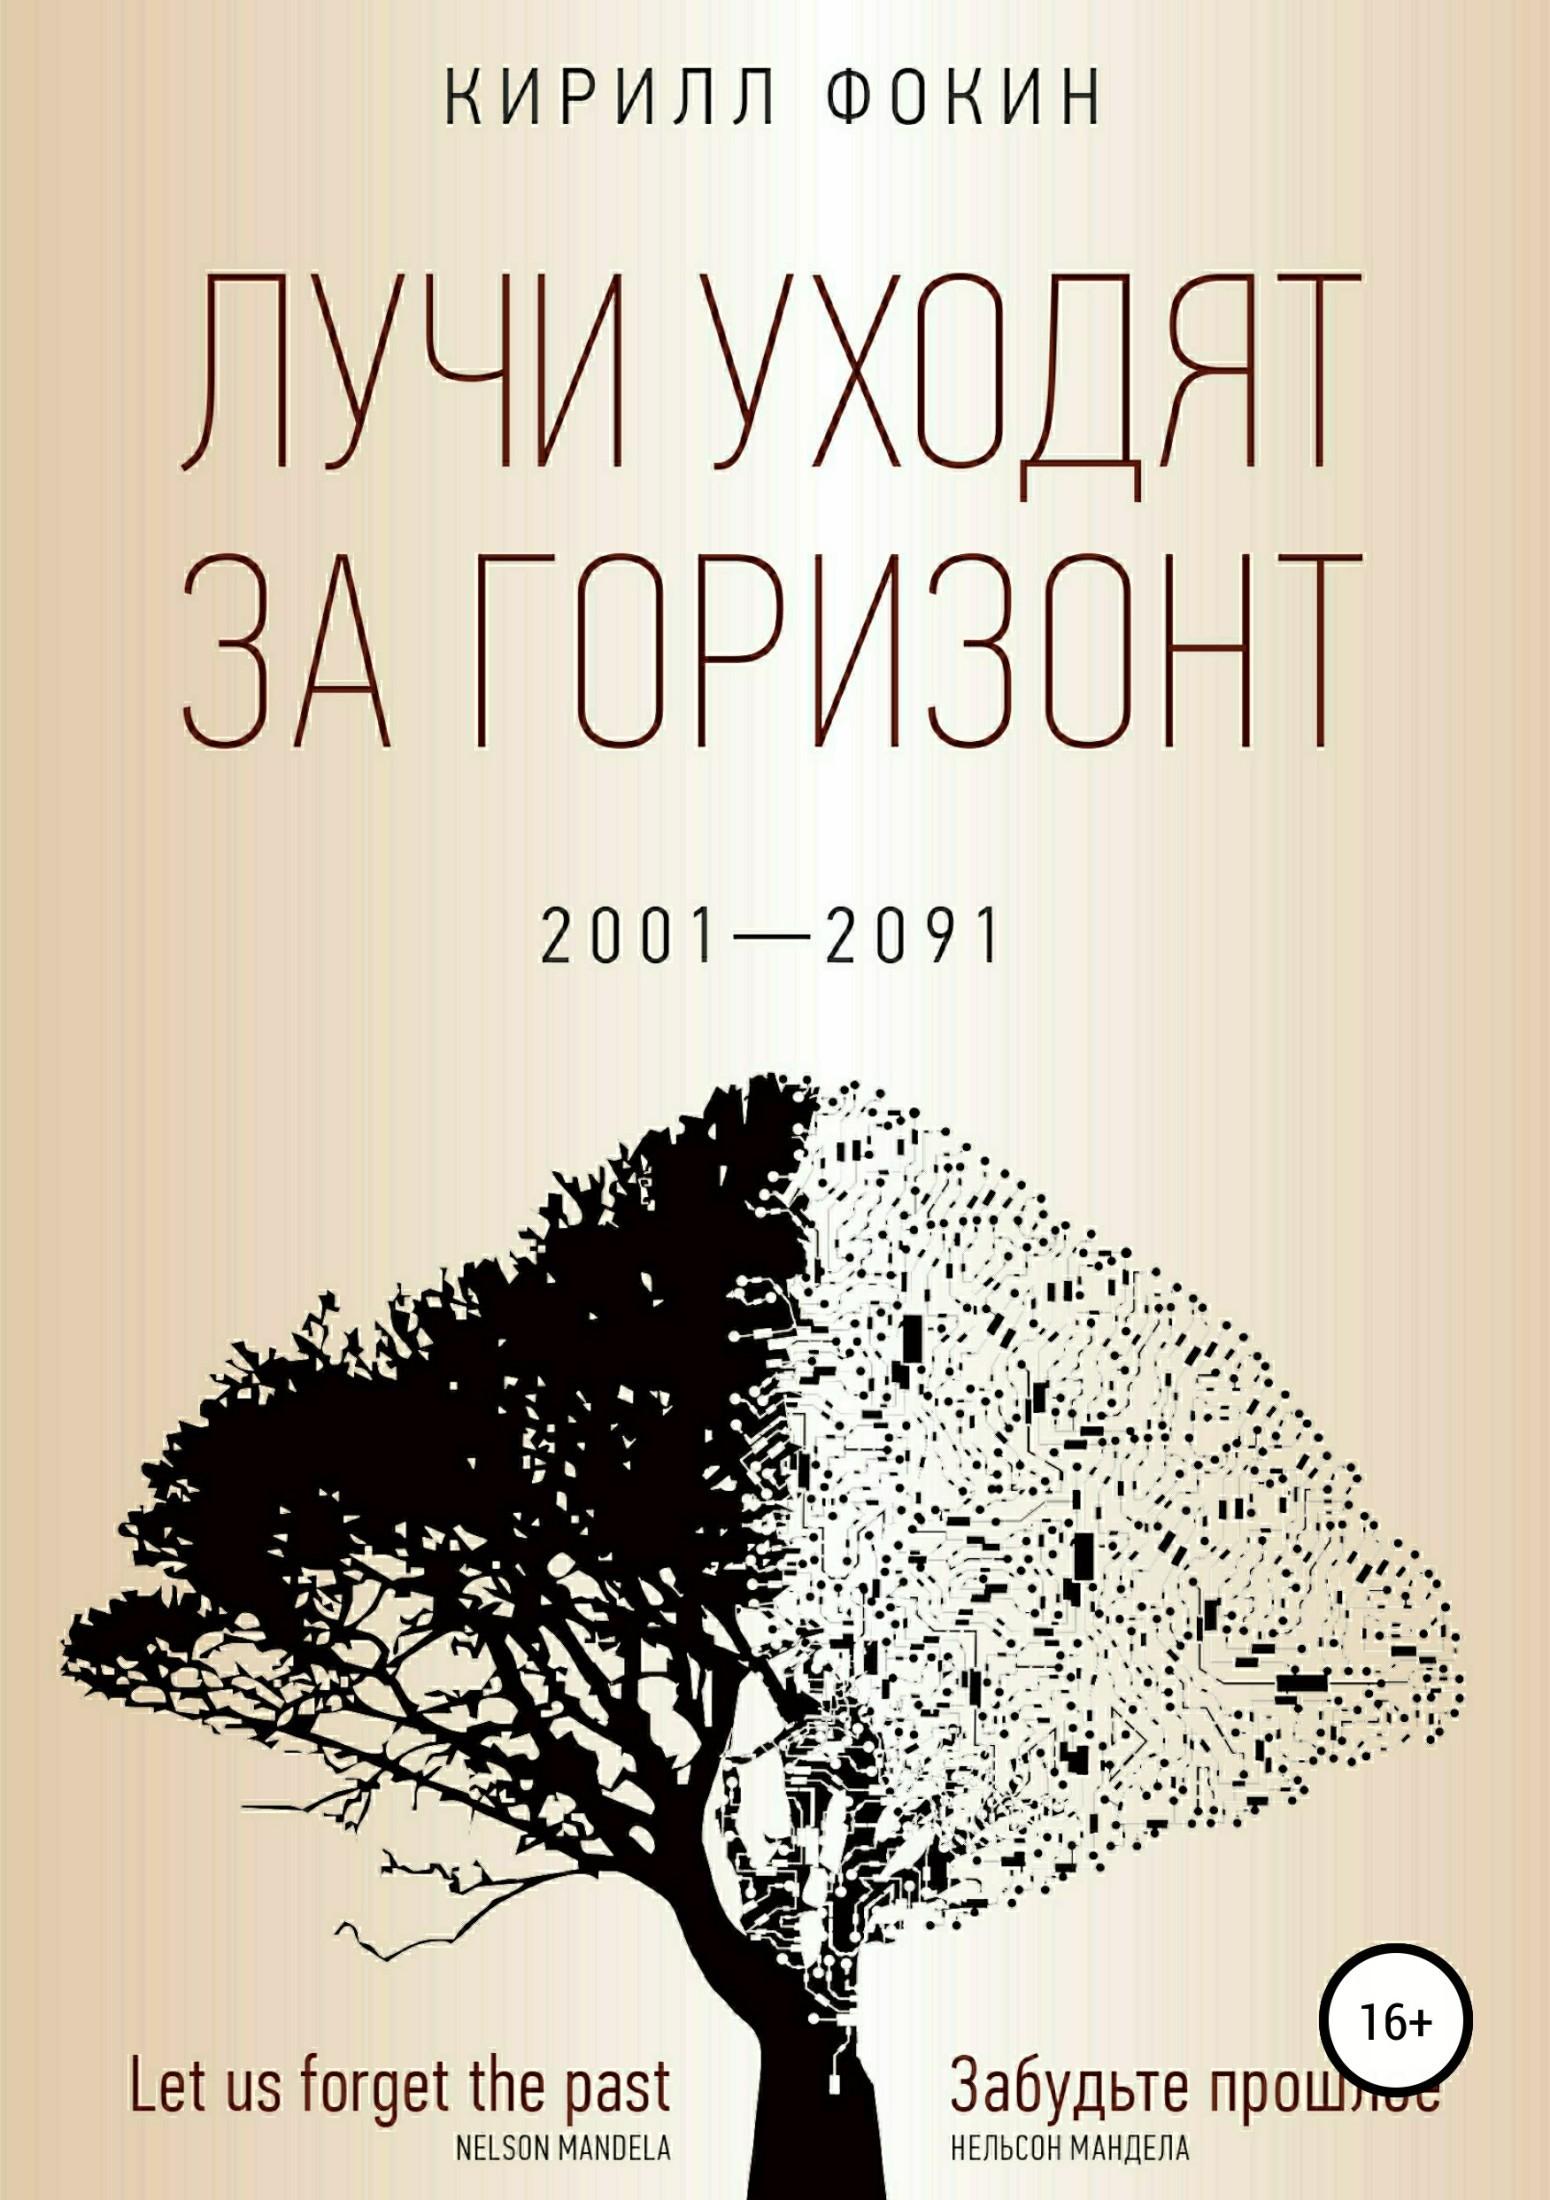 Кирилл Валерьевич Фокин Лучи уходят за горизонт фокин к лучи уходят за горизонт 2001 2091